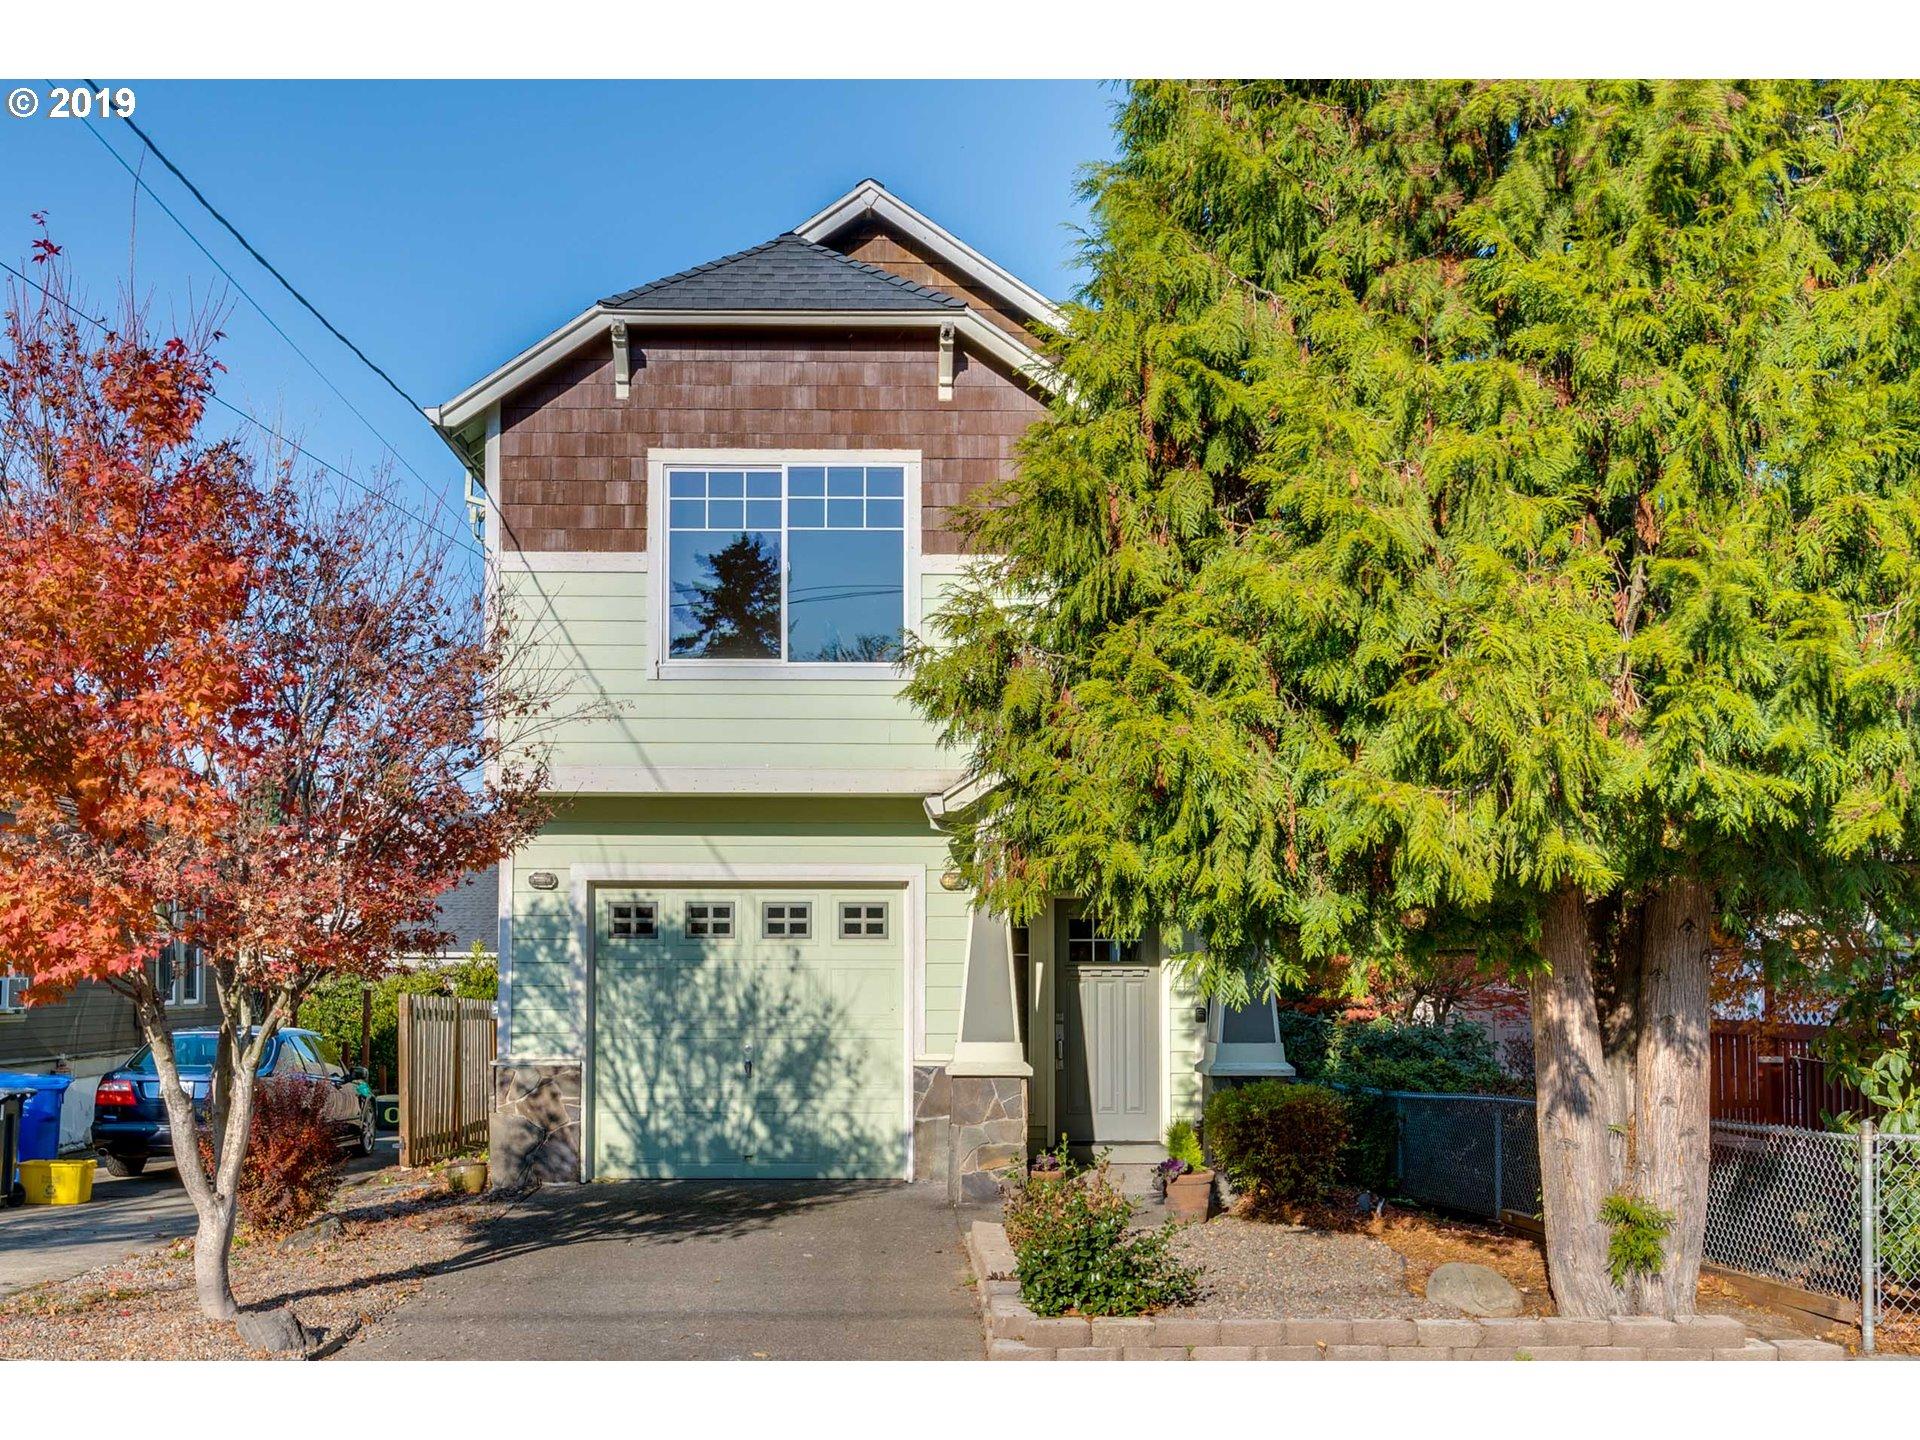 821 N TERRY ST, Portland OR 97217